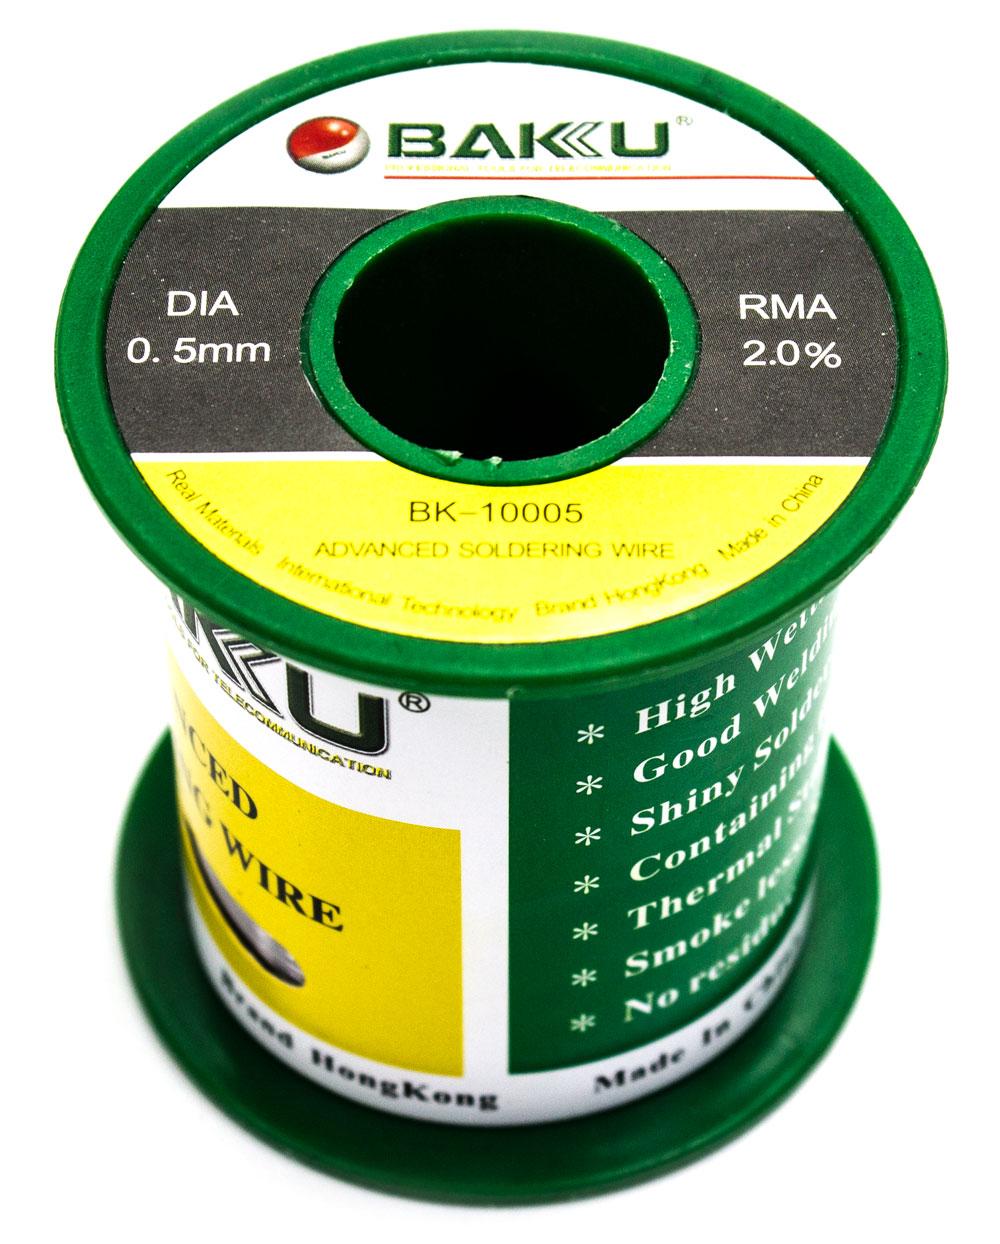 Estańo 0.5mm BAKU-10005 100G